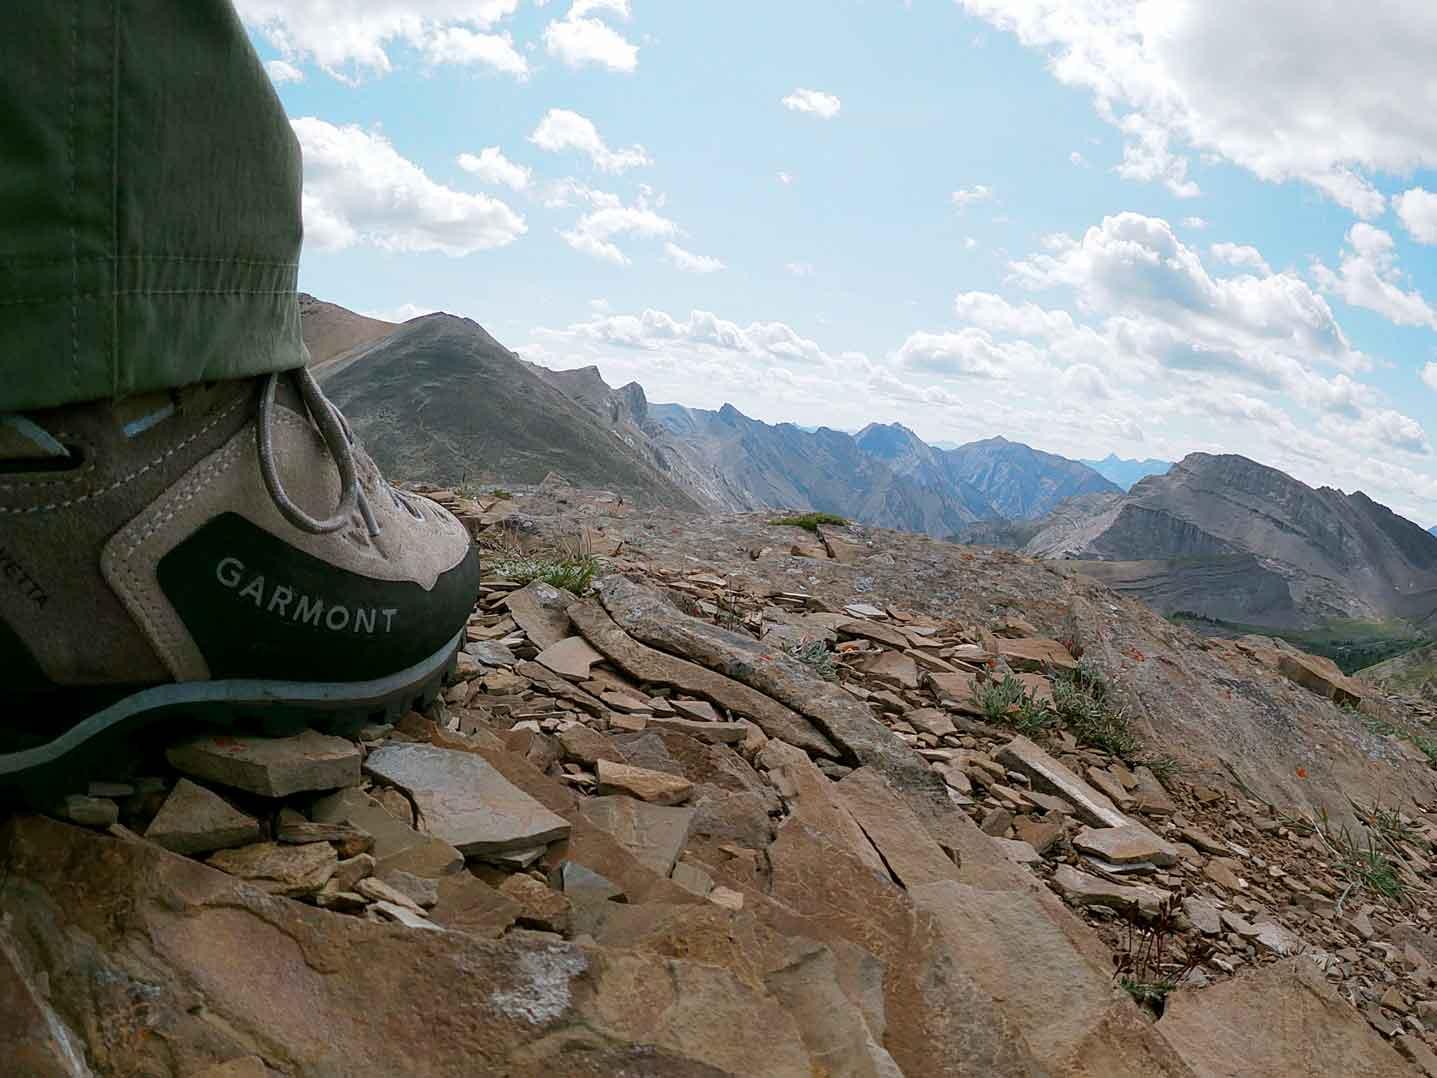 White Mountain Adventures Heli Hike Garmont Boots